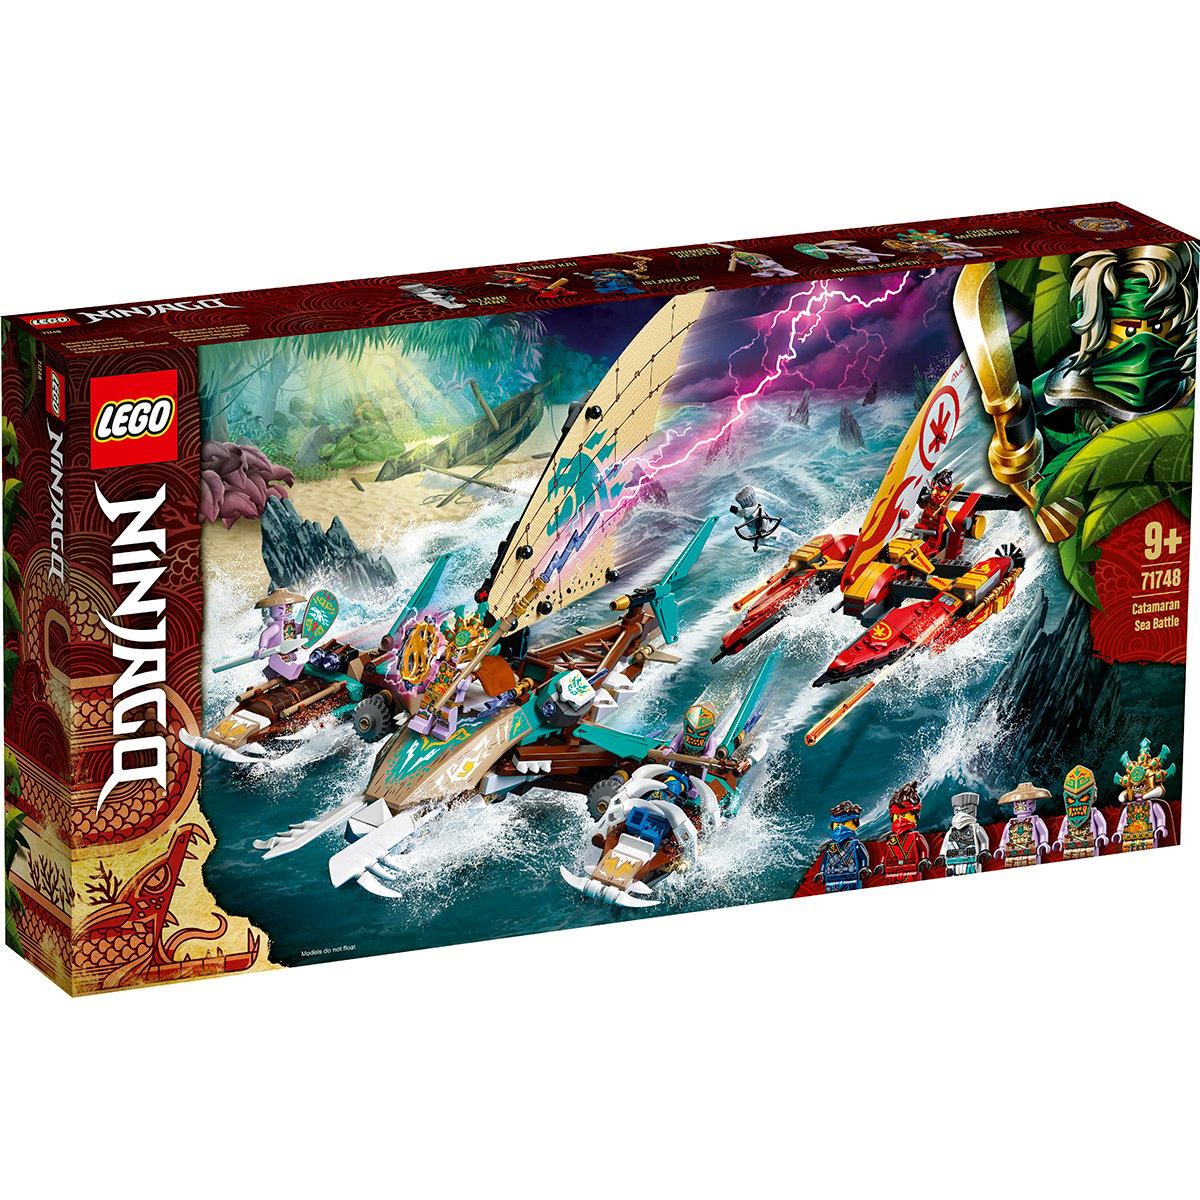 LEGO® Ninjago® - Lupta pe mare cu catamaranul (71748)